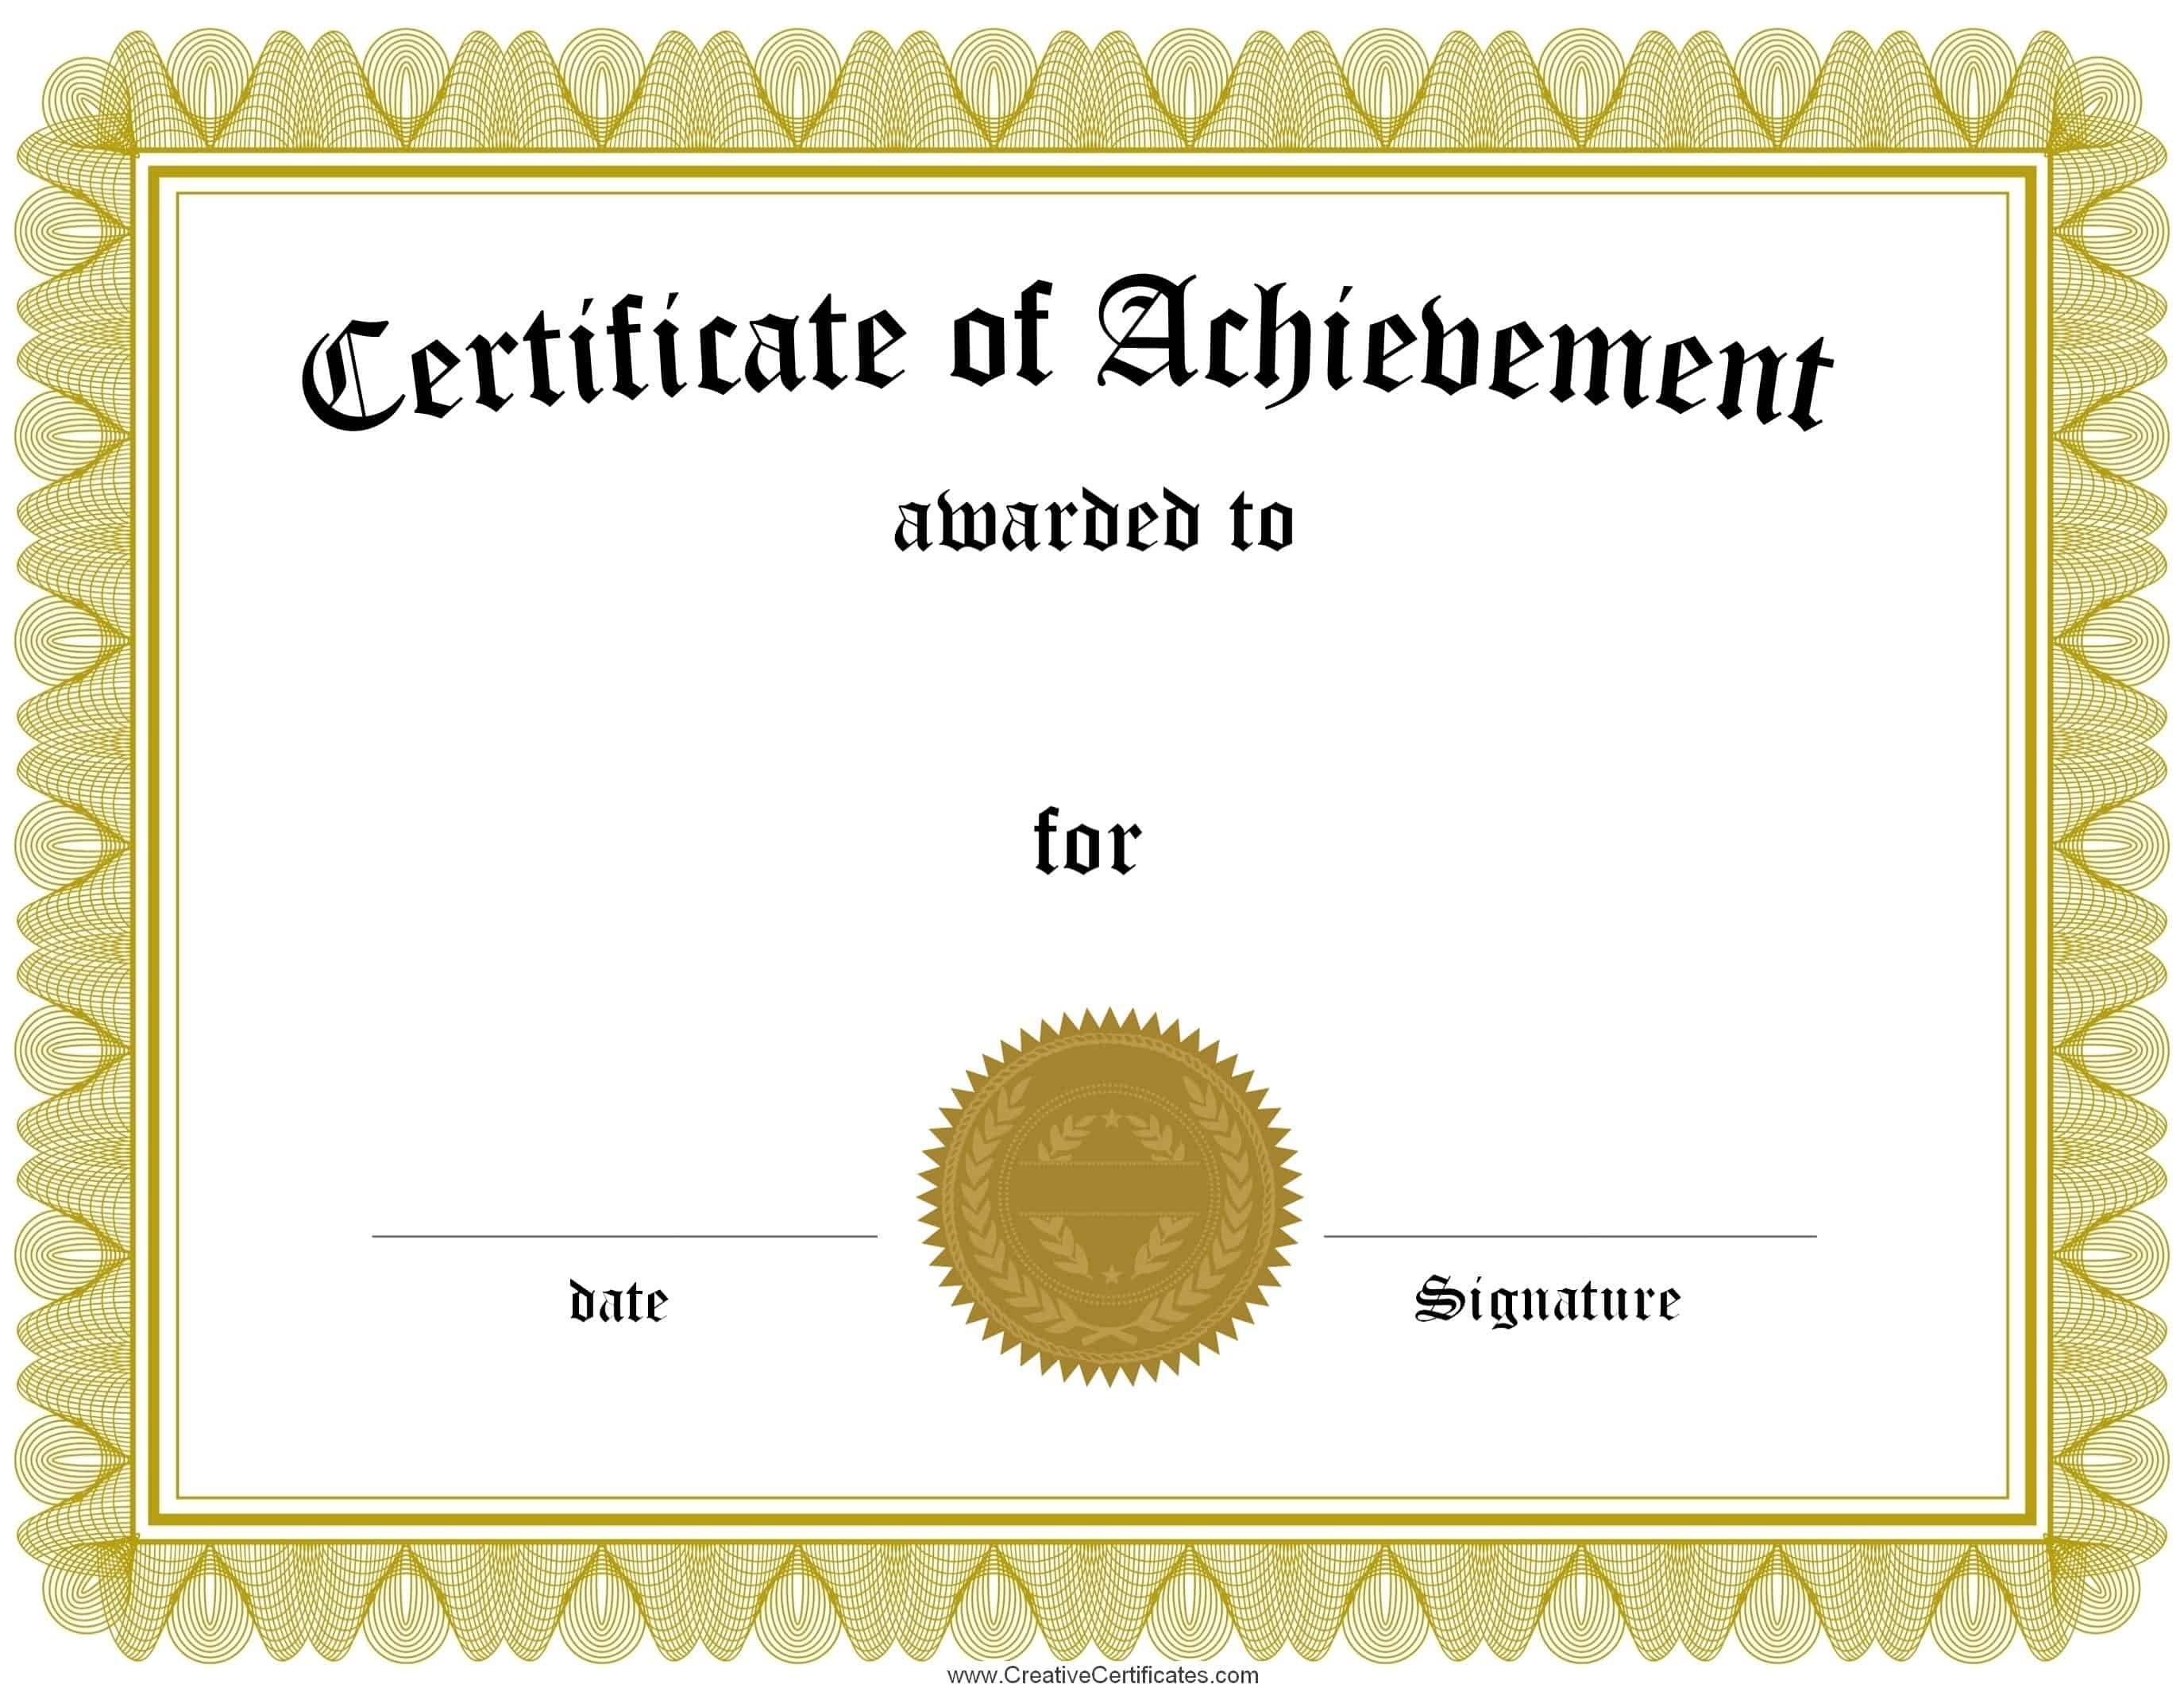 Free Customizable Certificate Of Achievement Inside Certificate Of Accomplishment Template Free